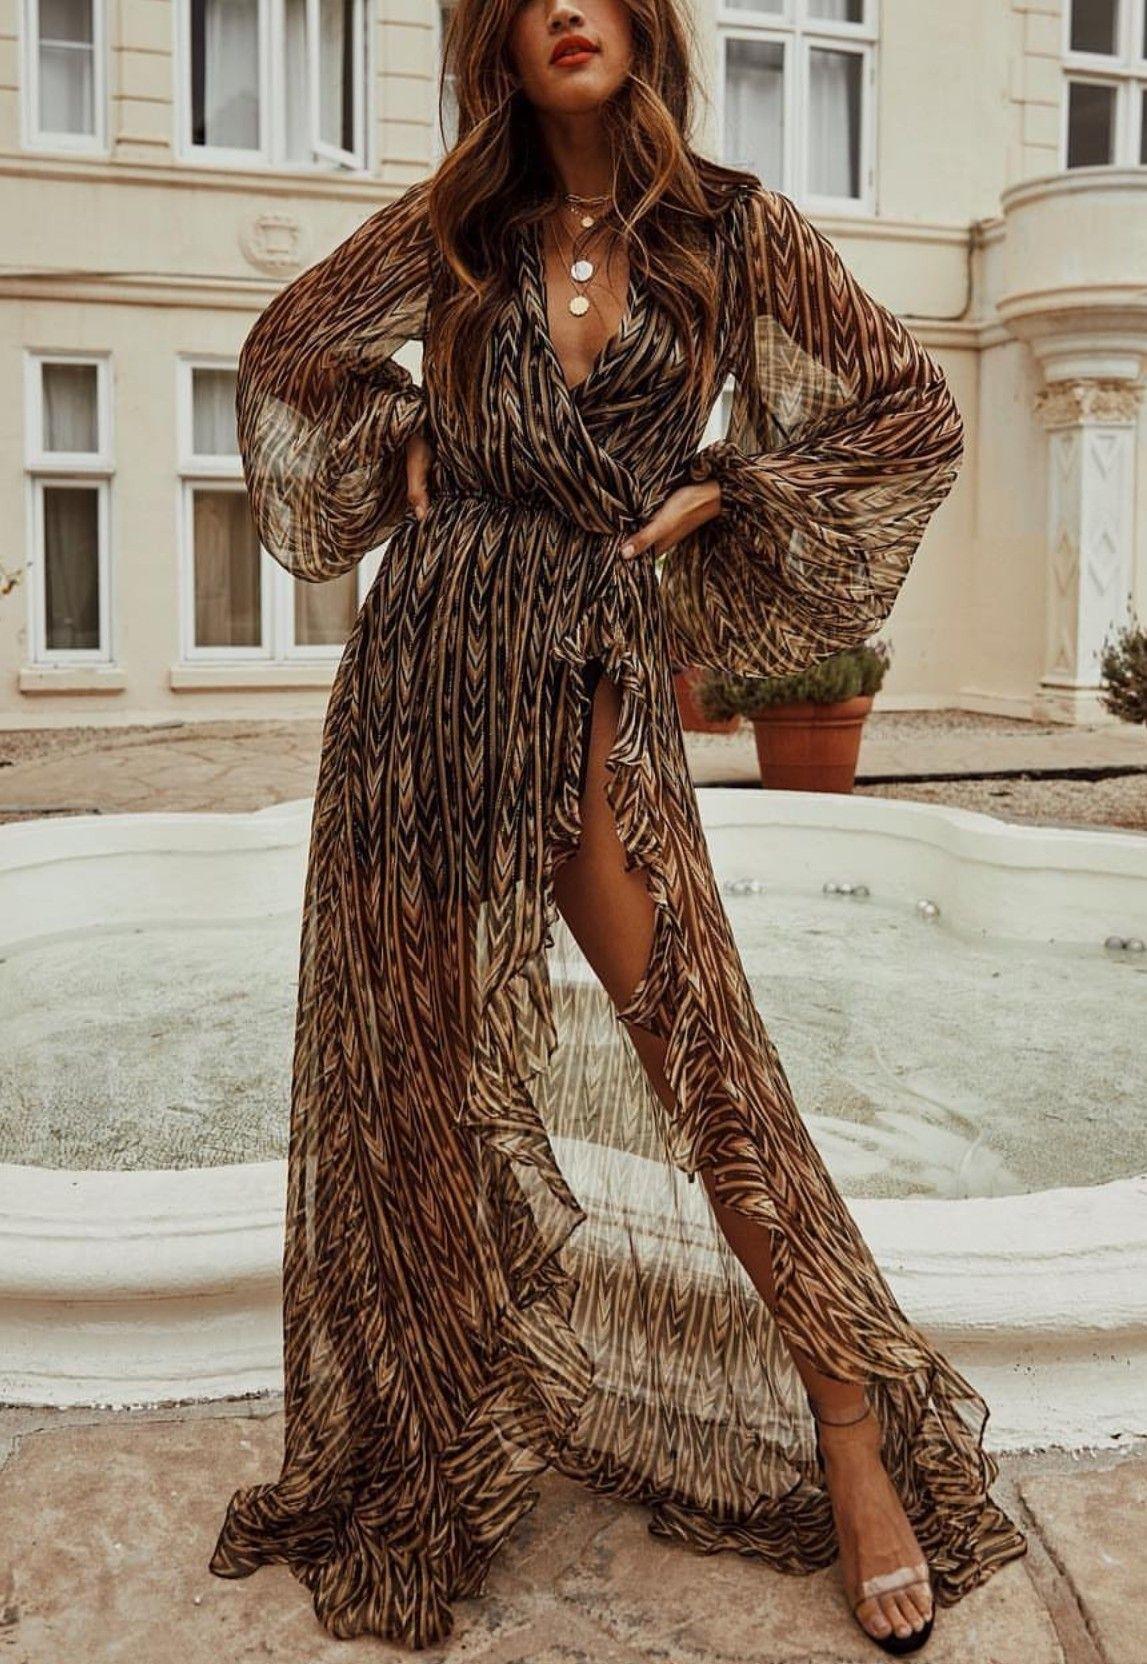 Elegant and minimalist boho style inspiration. Long brown dress